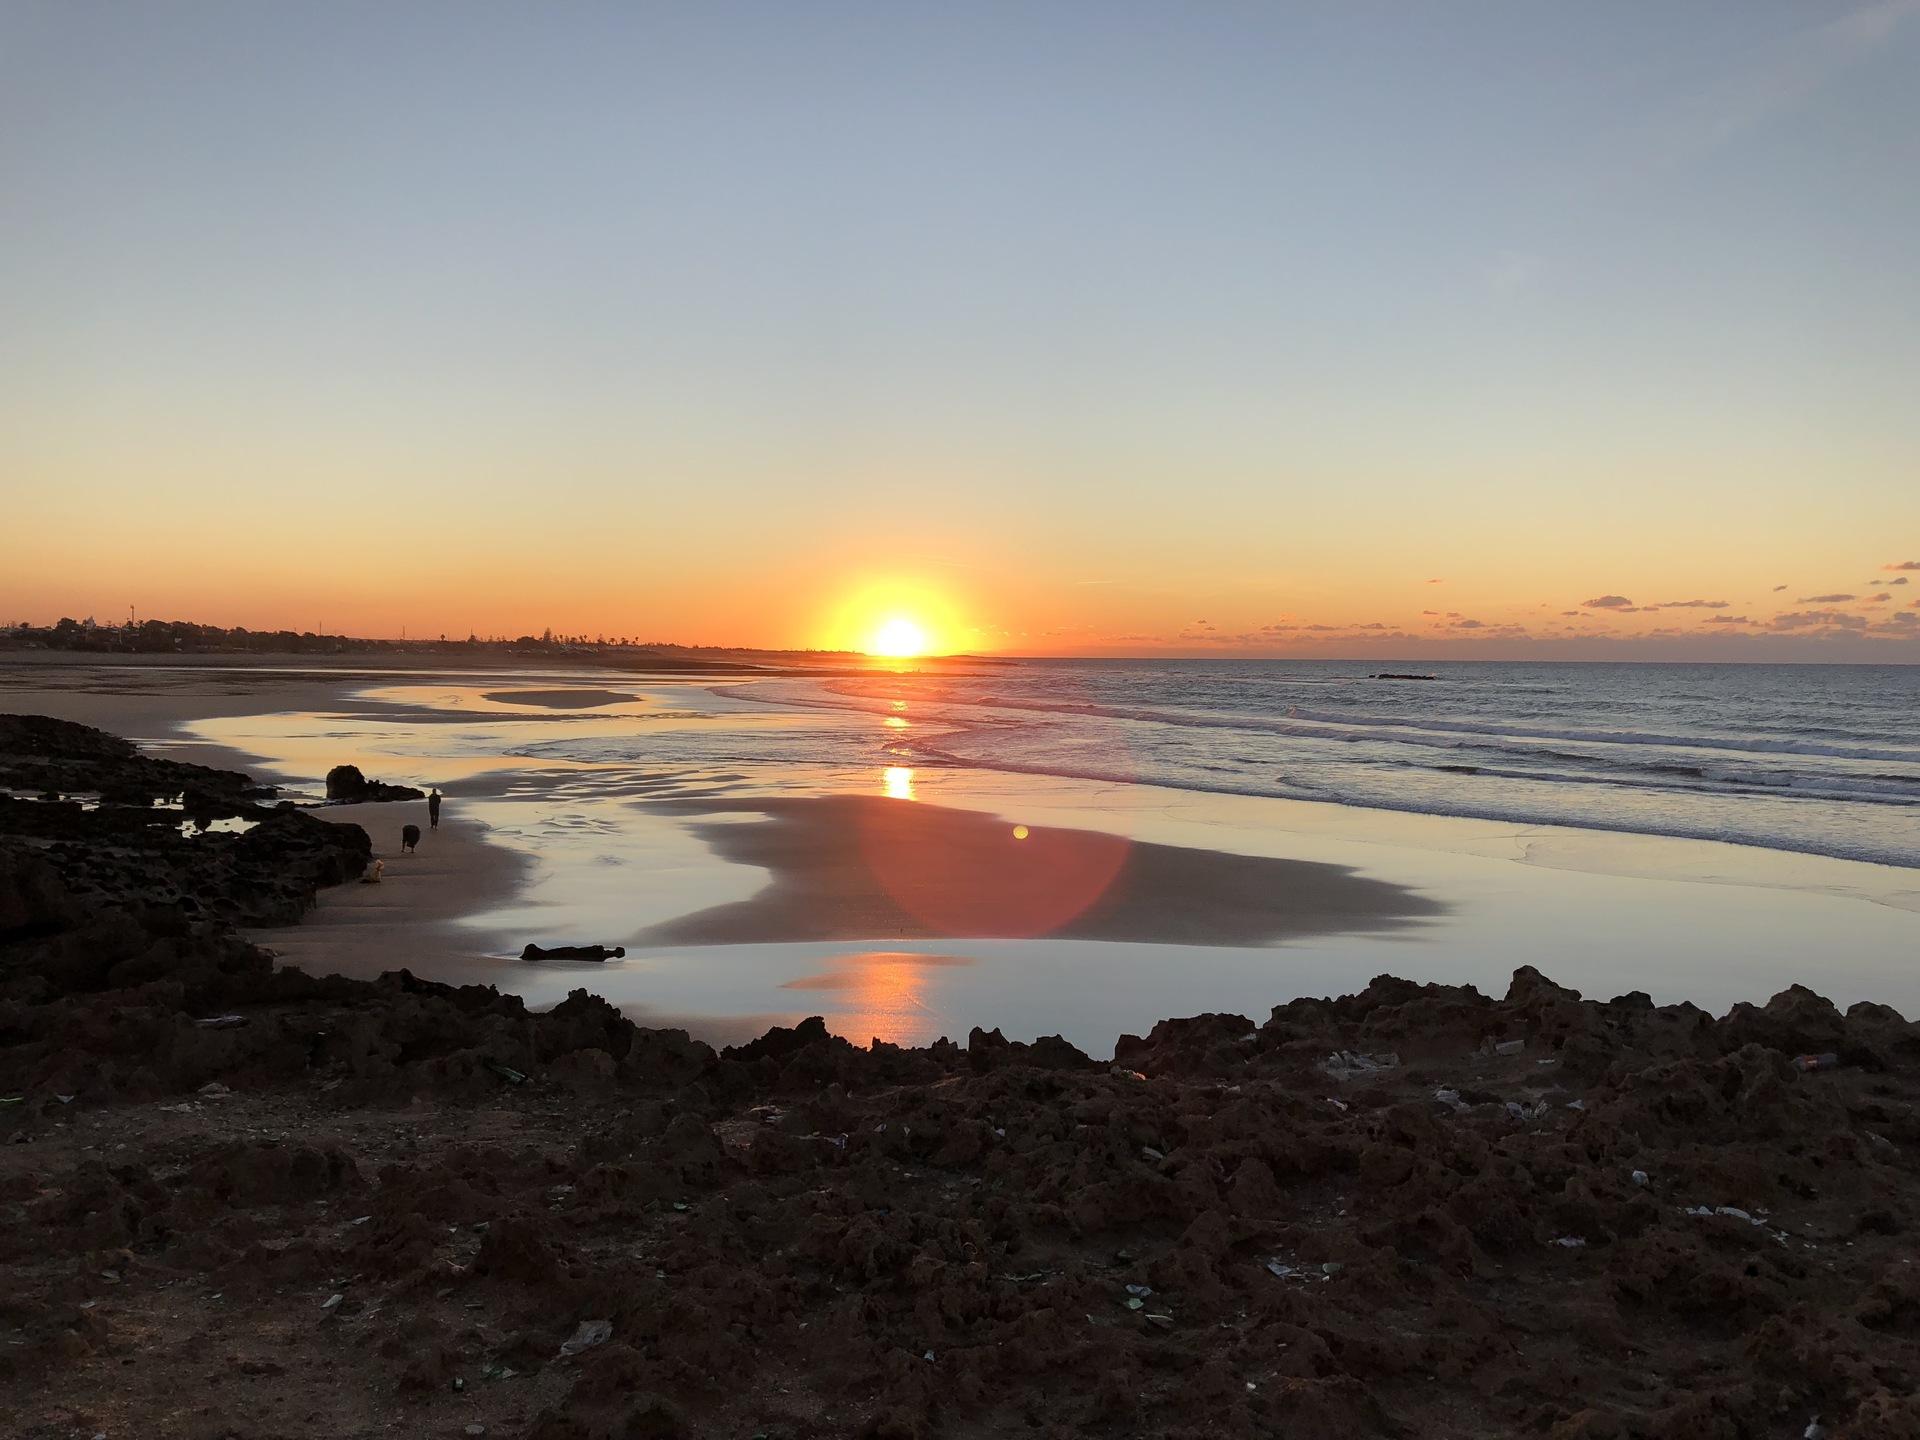 Sunset beach Morocco  | boubouh, sunset, water, dawn